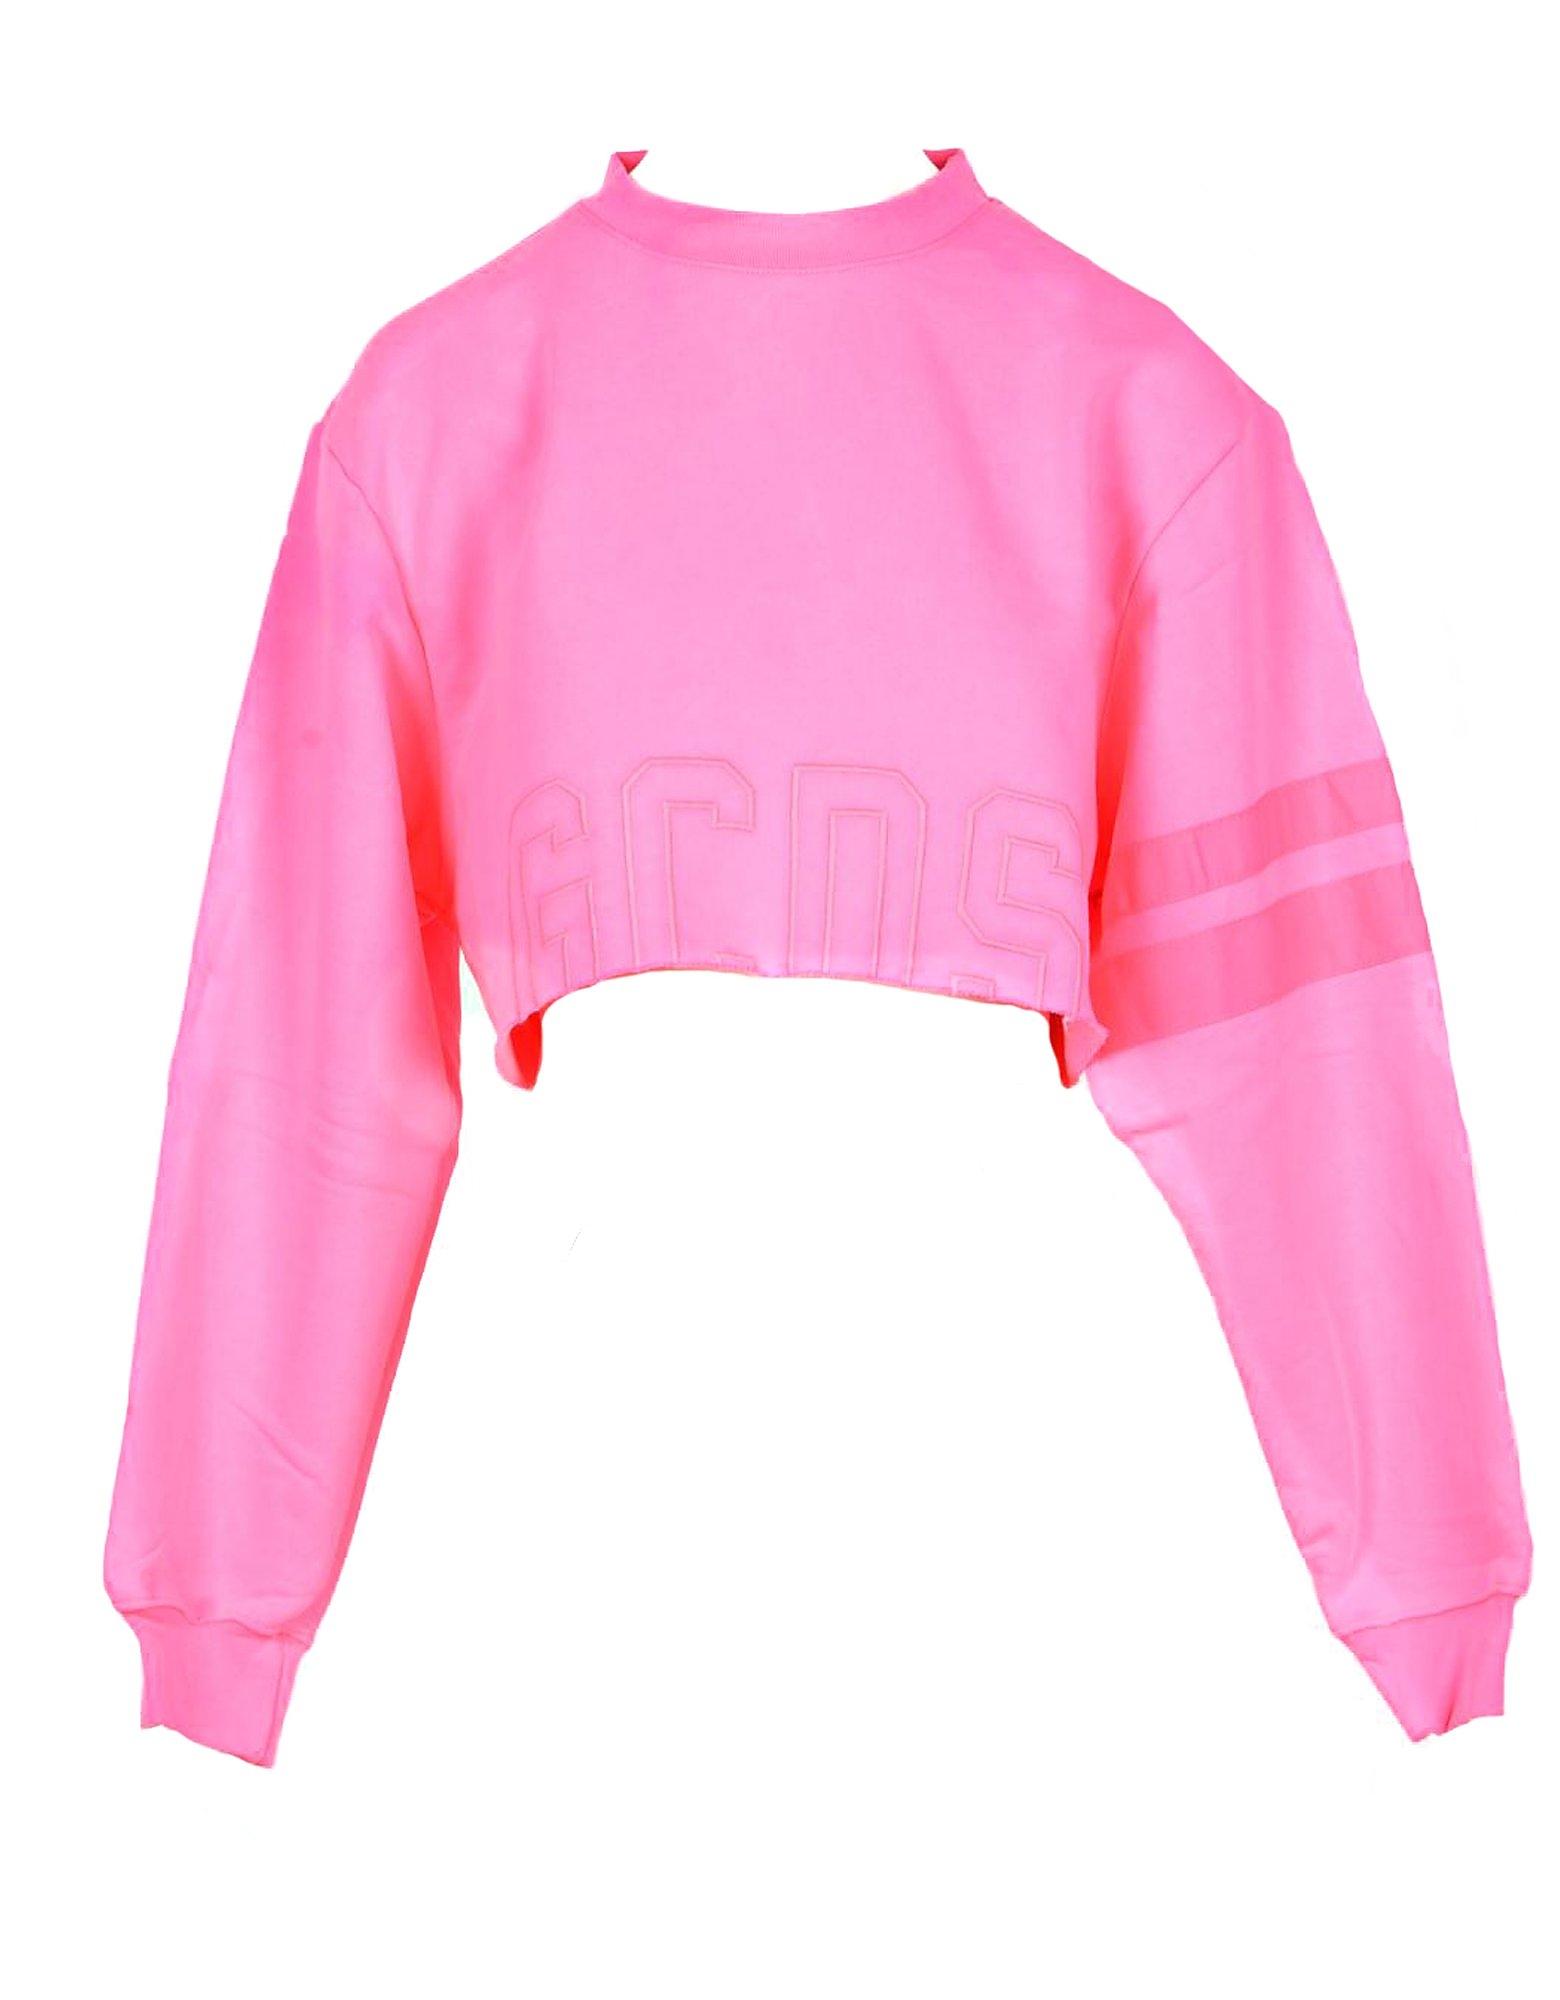 GCDS Designer Sweatshirts, Women's Shocking Pink Sweatshirt